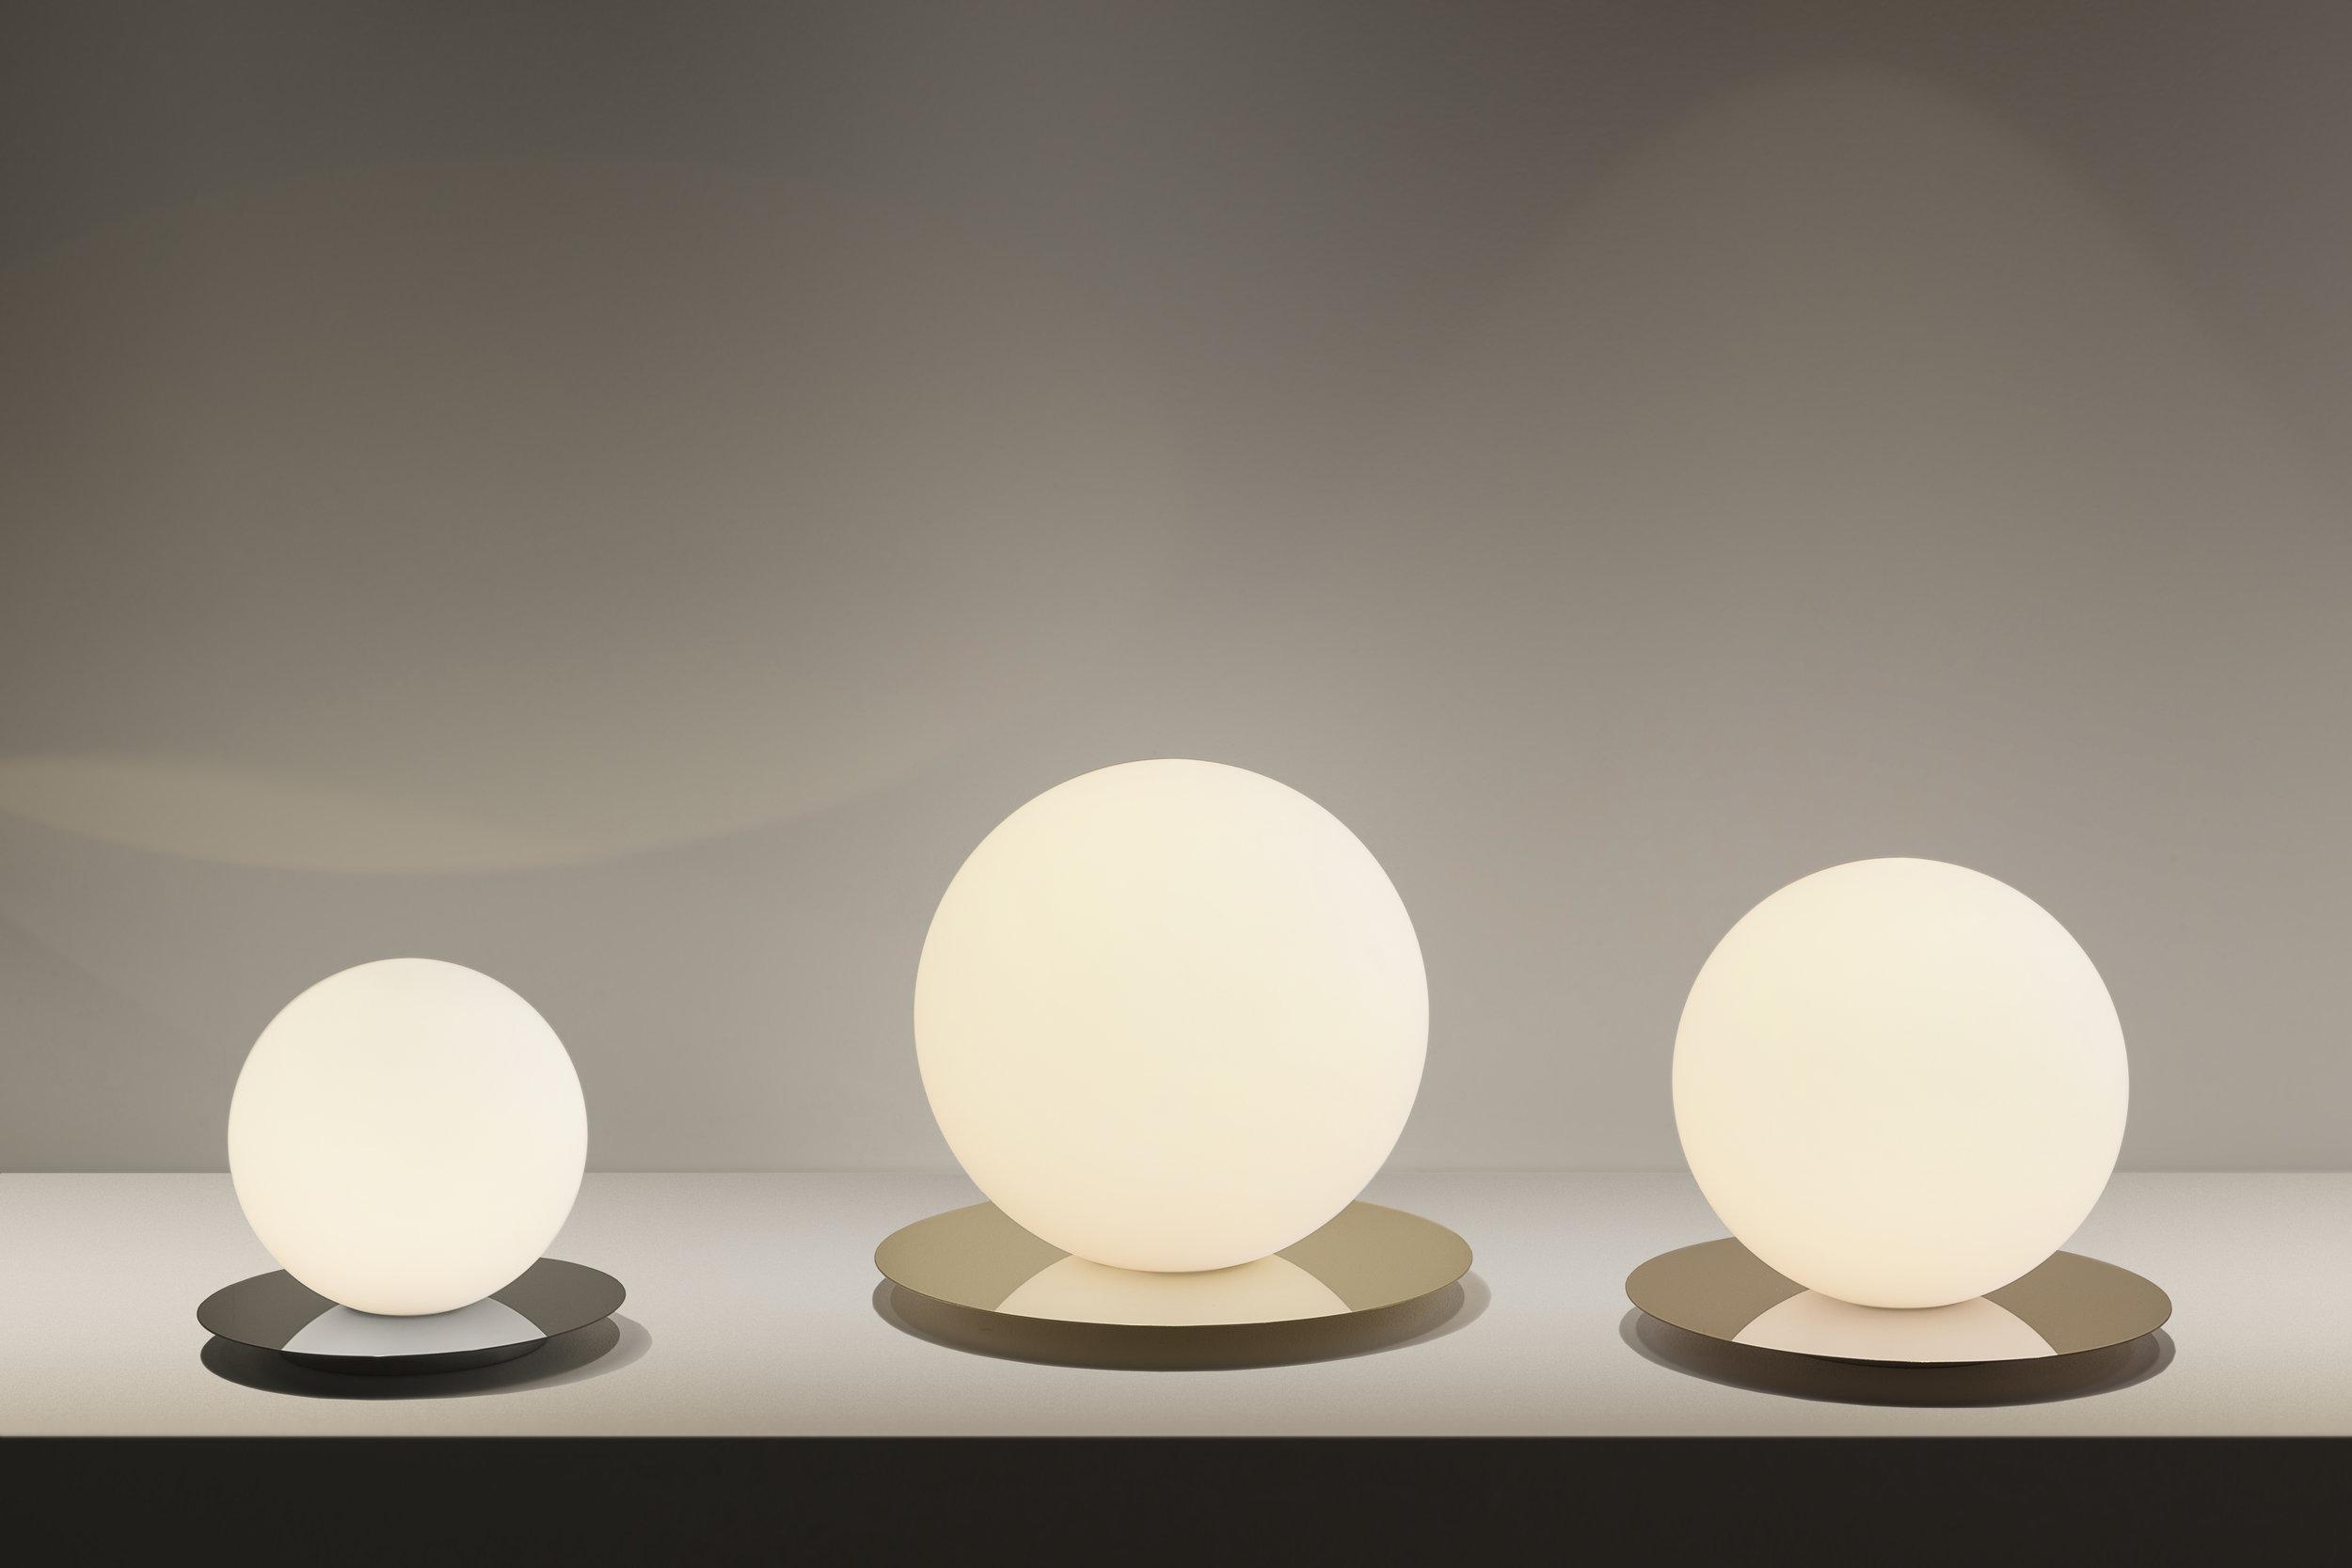 Bola Sphere Table, Evironmental, Trade Show_300.jpg